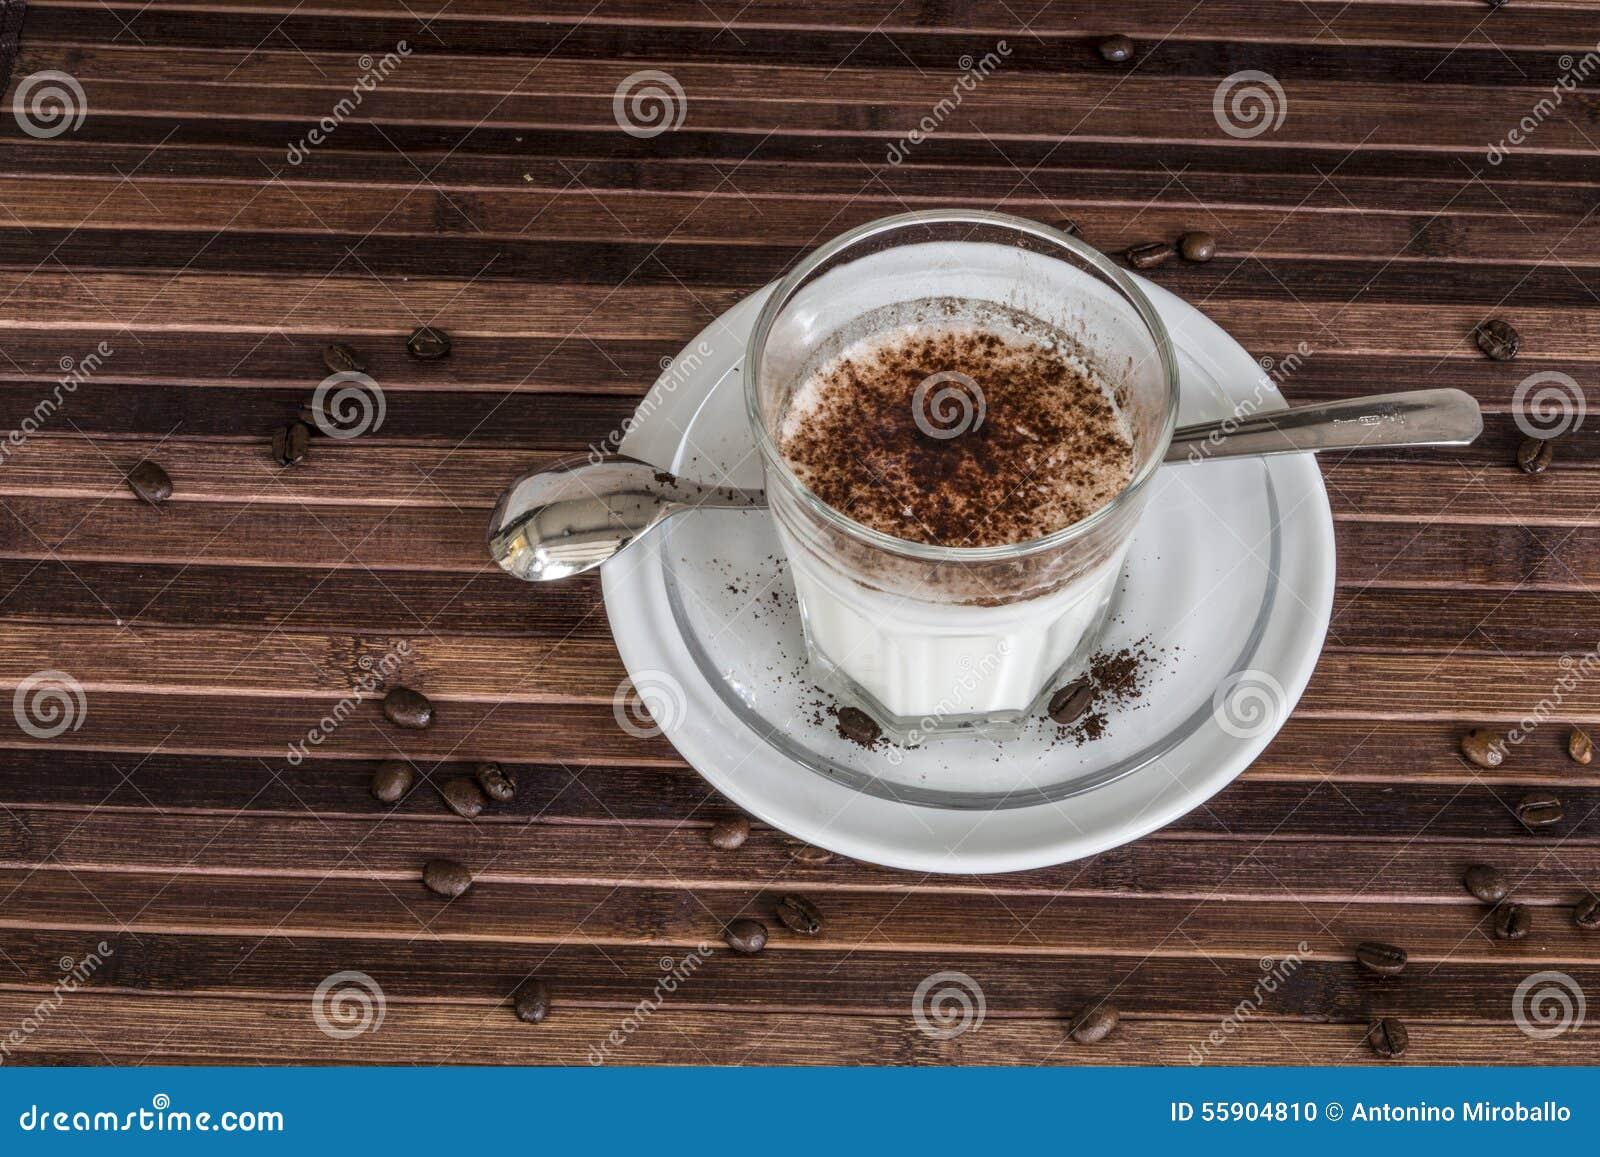 how to make cocoa powder milk